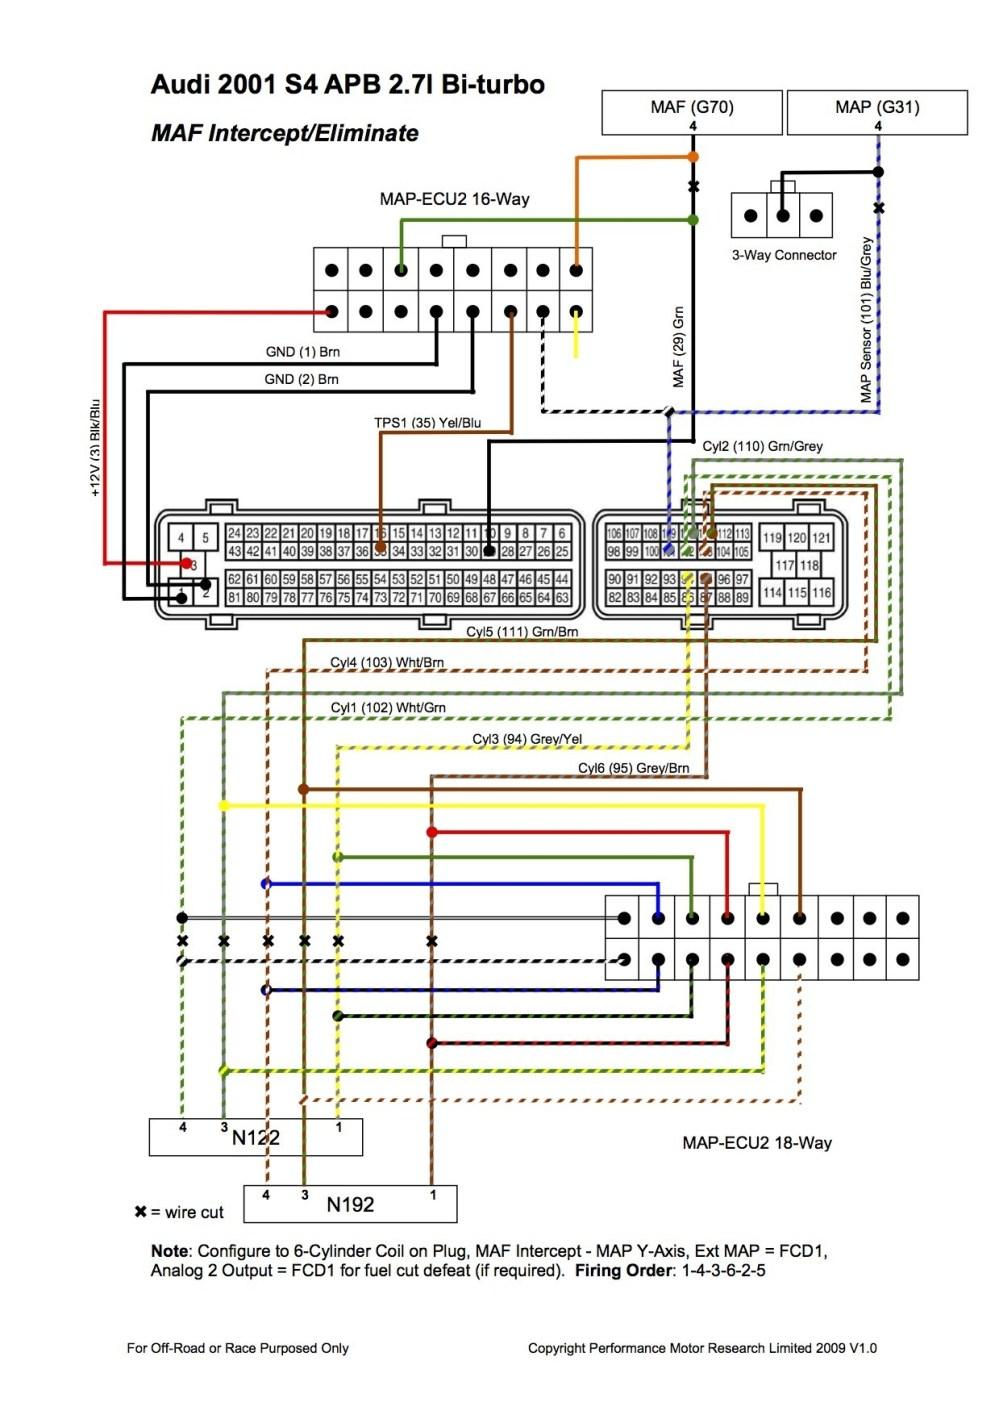 medium resolution of 2002 dodge ram 1500 stereo wiring diagram free wiring diagram dodge ram 1500 club cab 2002